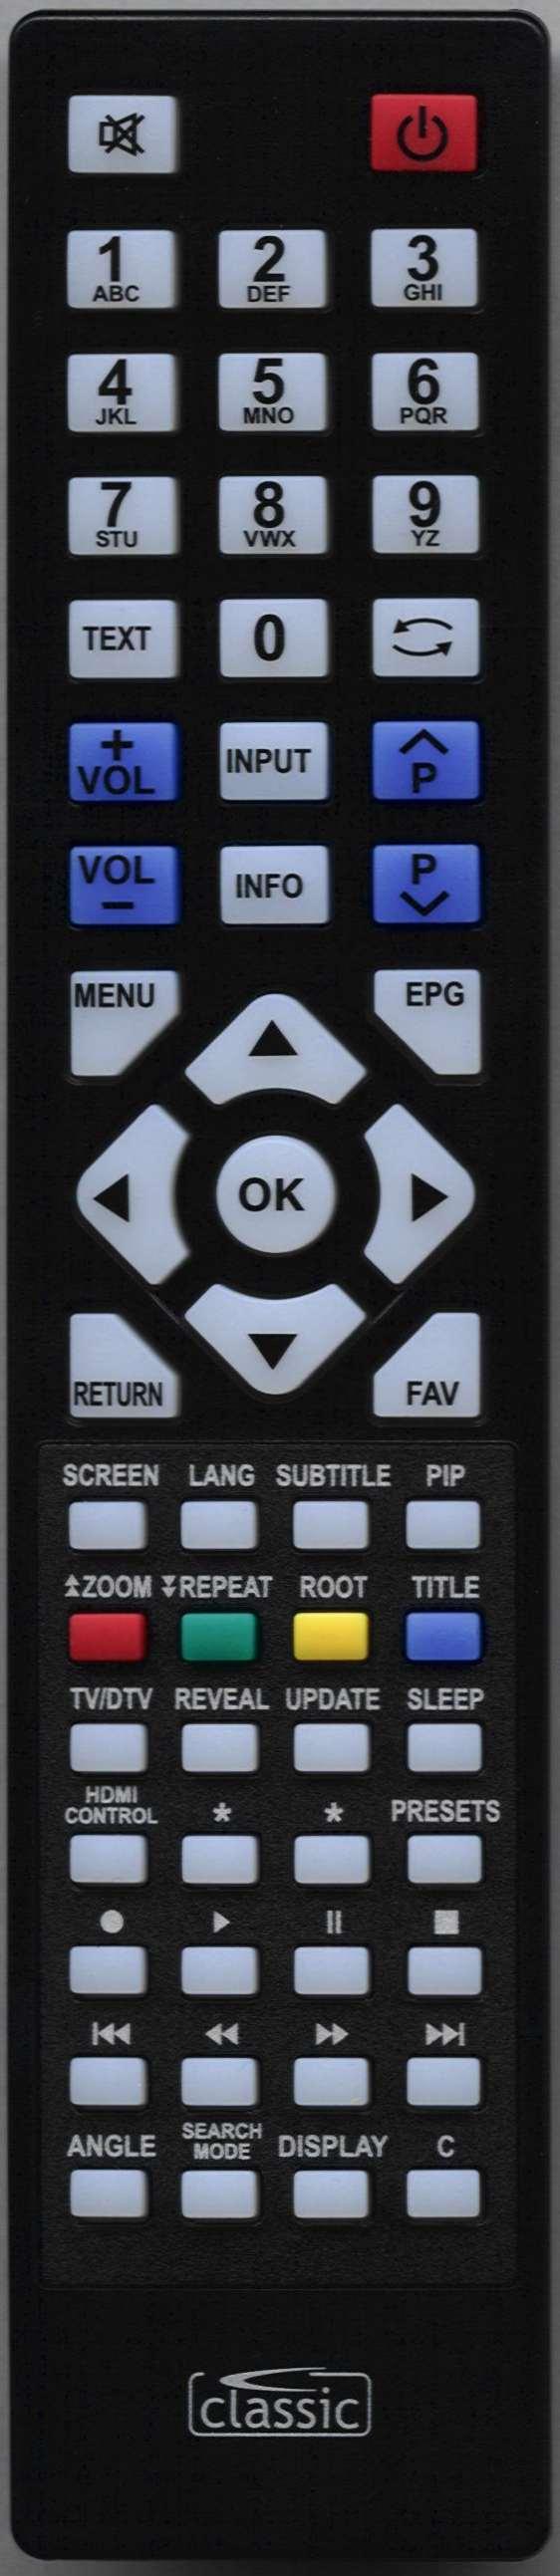 LUXOR 46CCFLT2 Remote Control Alternative